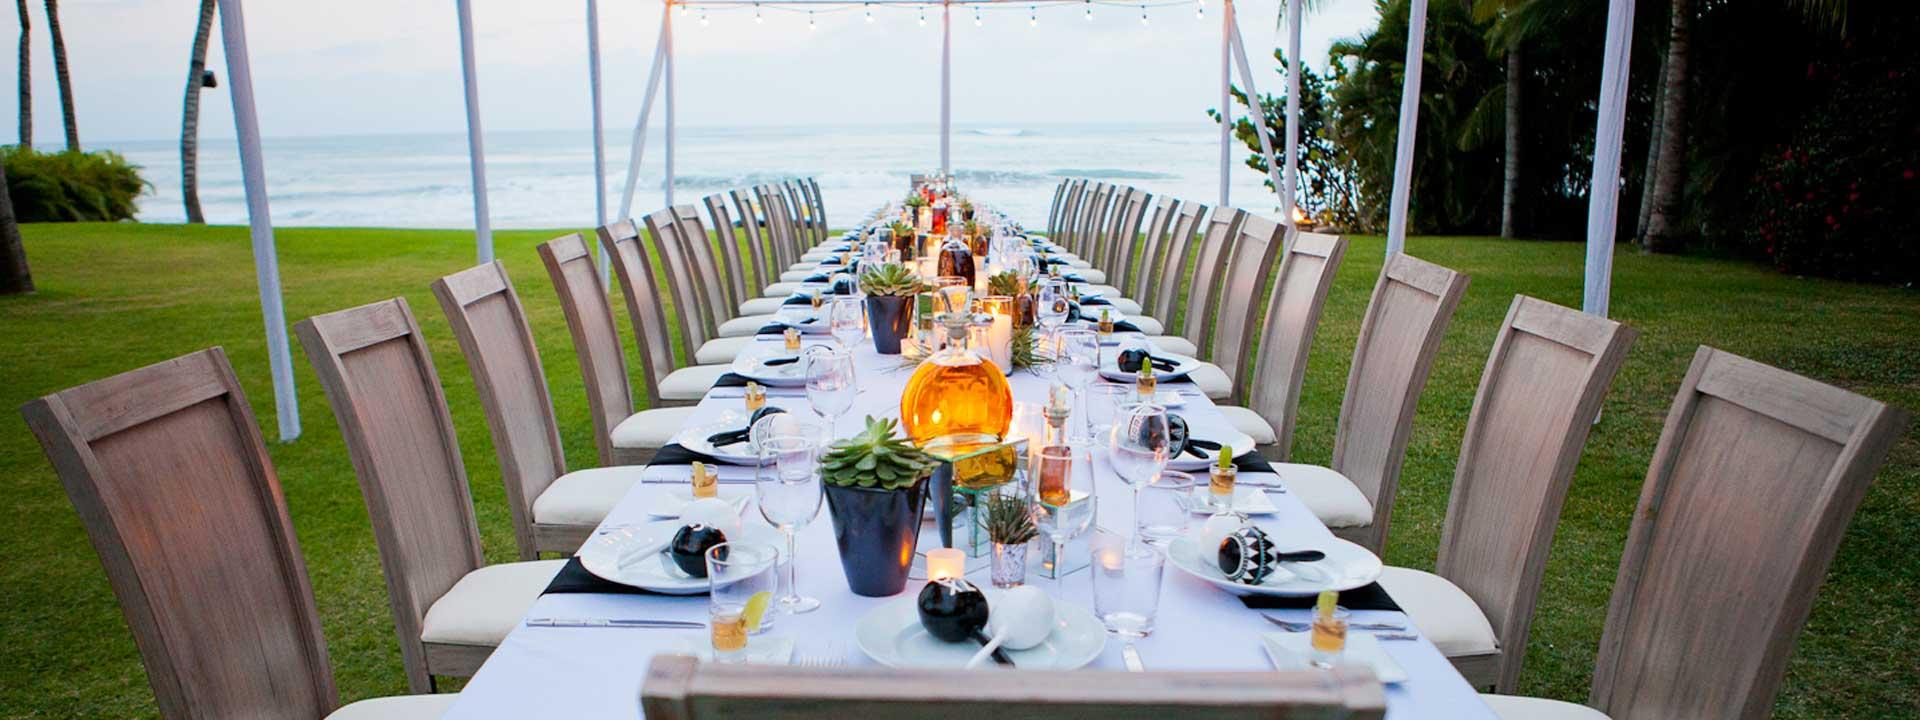 Wedding Planner Puerto Vallarta Punta Mita Weddings Destination